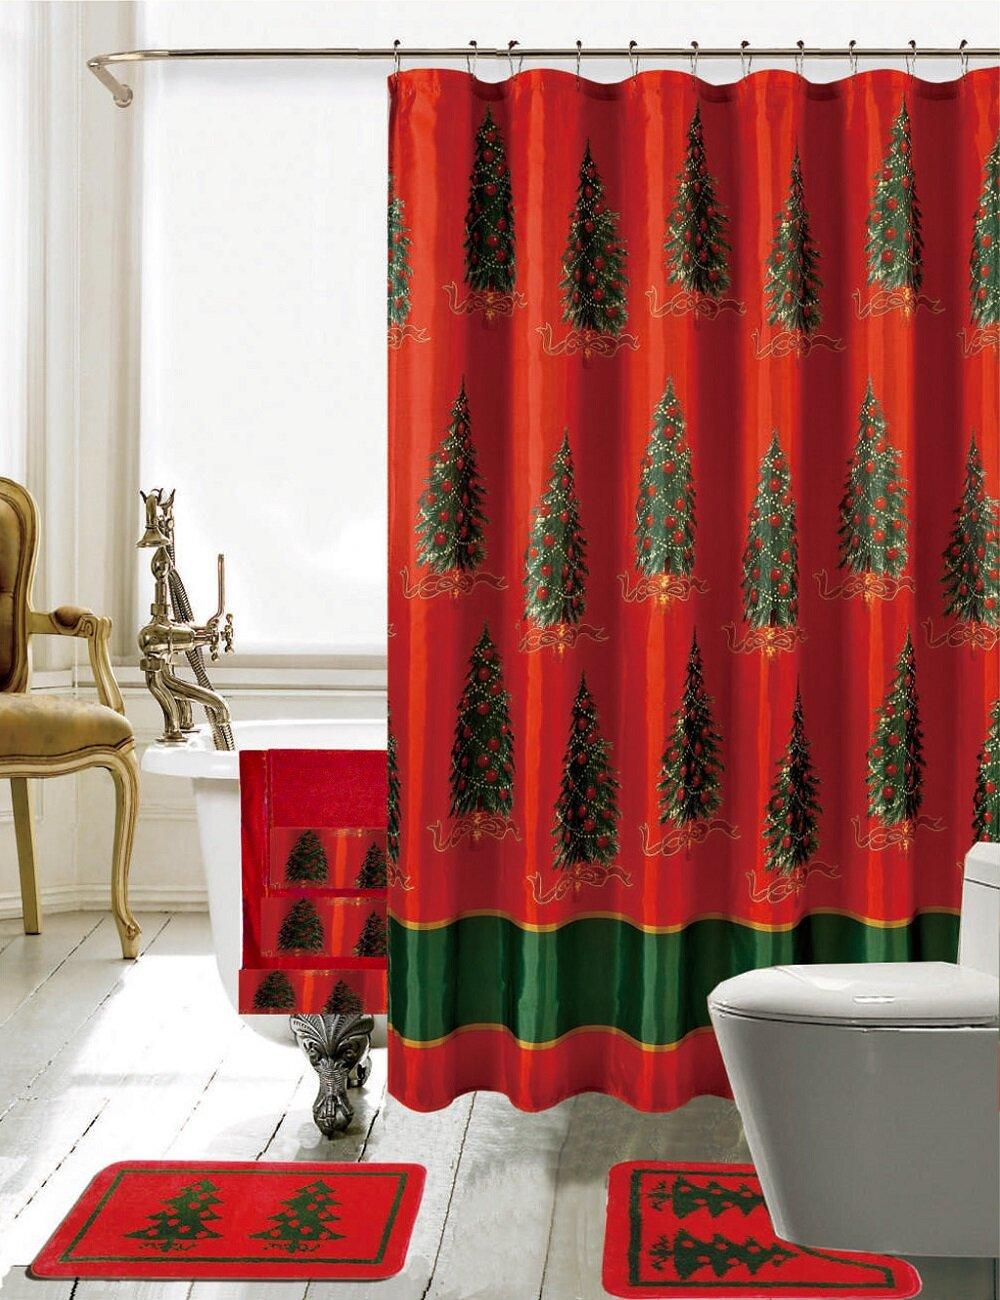 The Holiday Aisle Christmas Bathroom Decor 18 Piece Nature/Floral Shower Curtain Set & Reviews | Wayfair